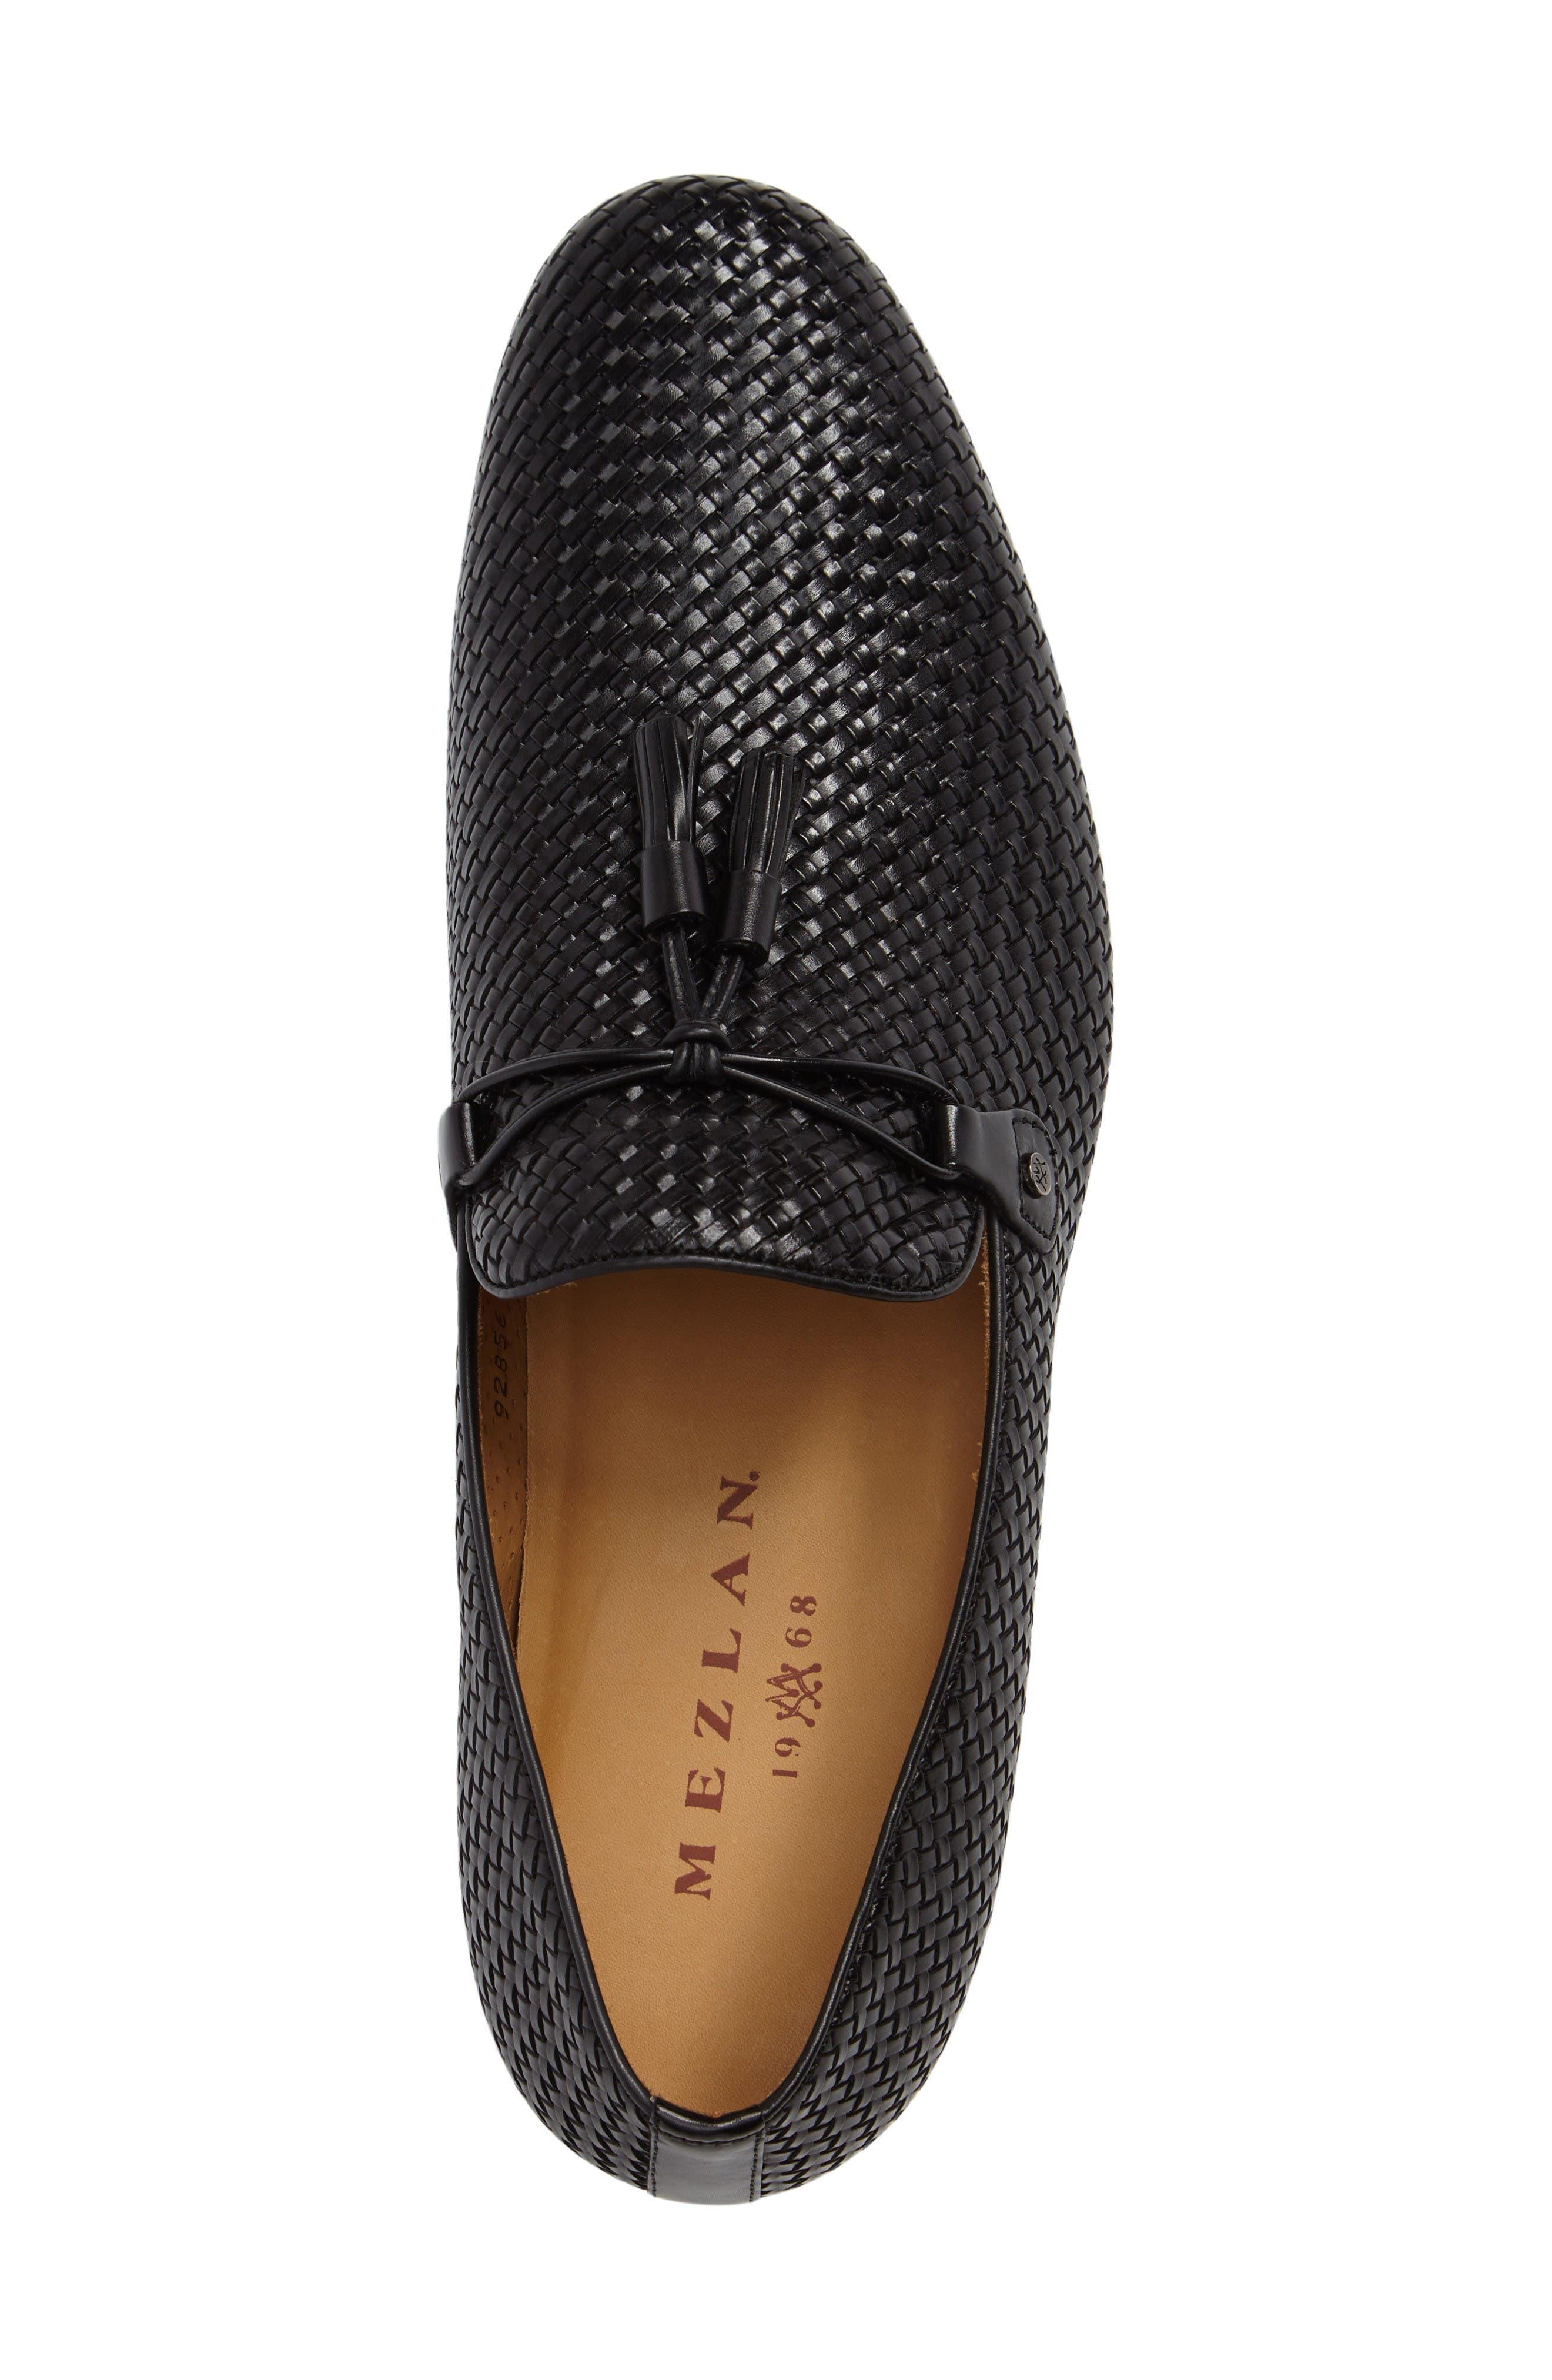 Turning Woven Tassel Loafer,                             Alternate thumbnail 5, color,                             Black Leather